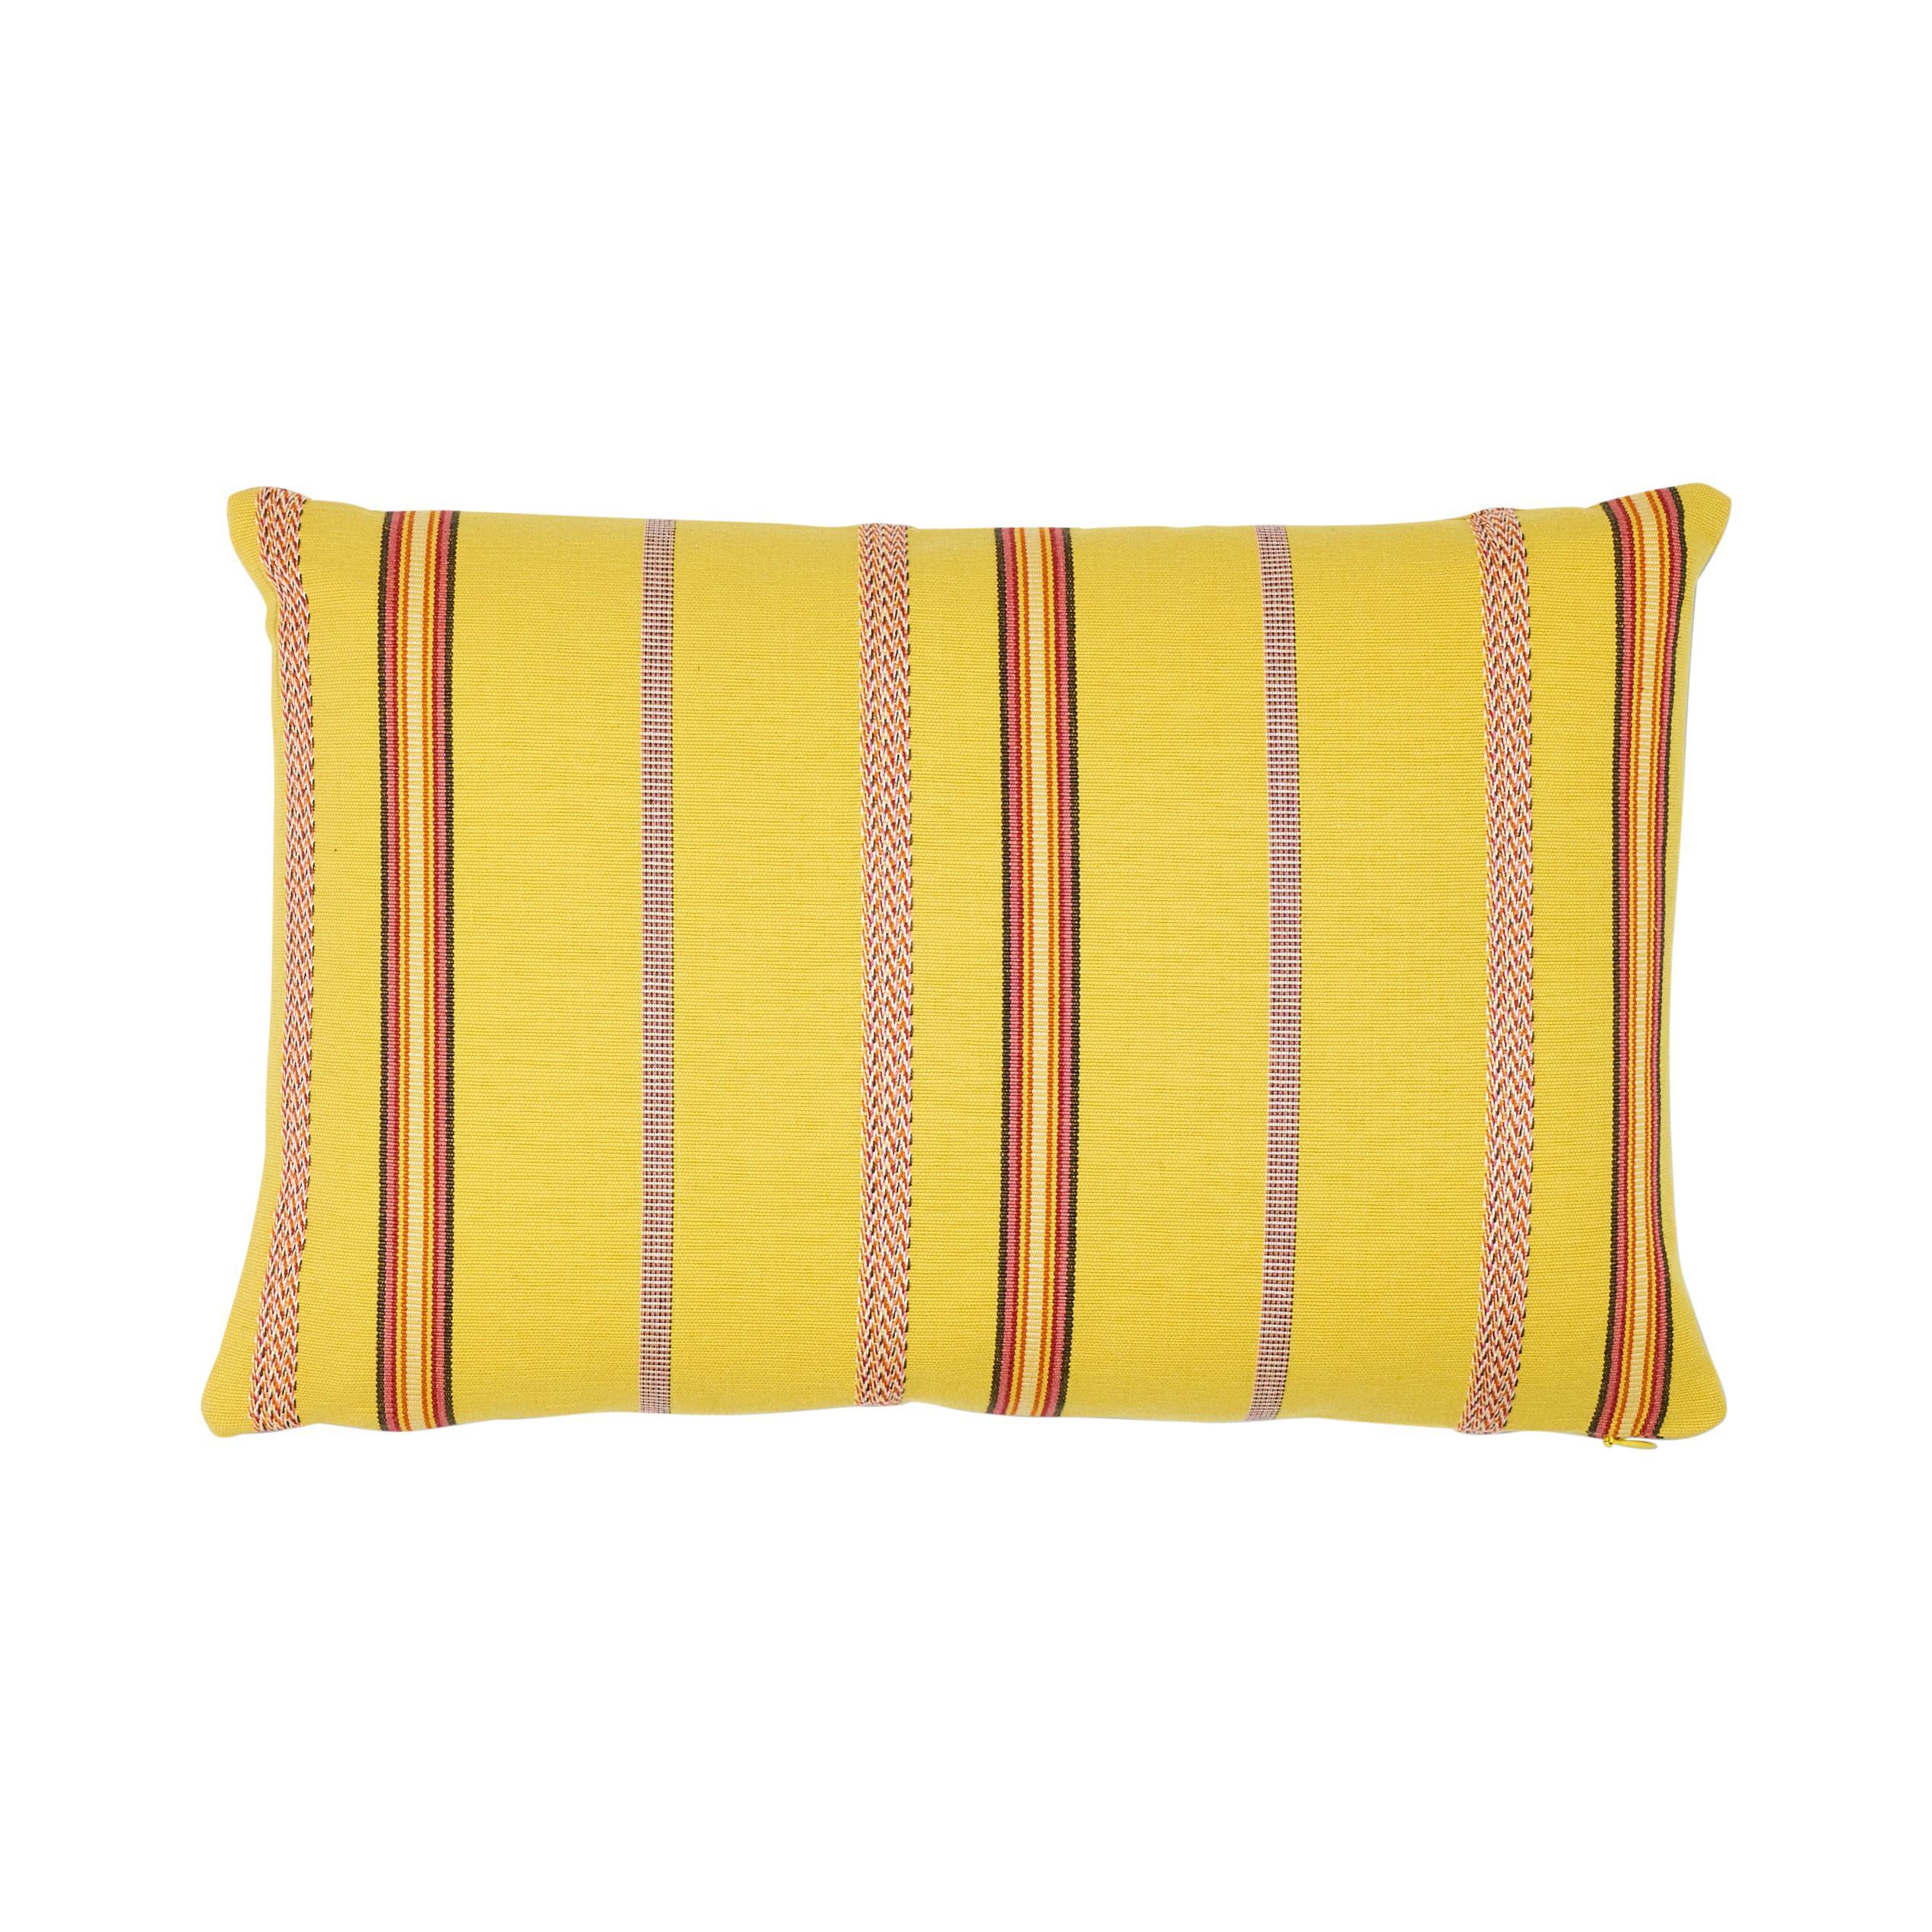 Schumacher Kayenta Yellow Two-Sided Cotton Lumbar Pillow